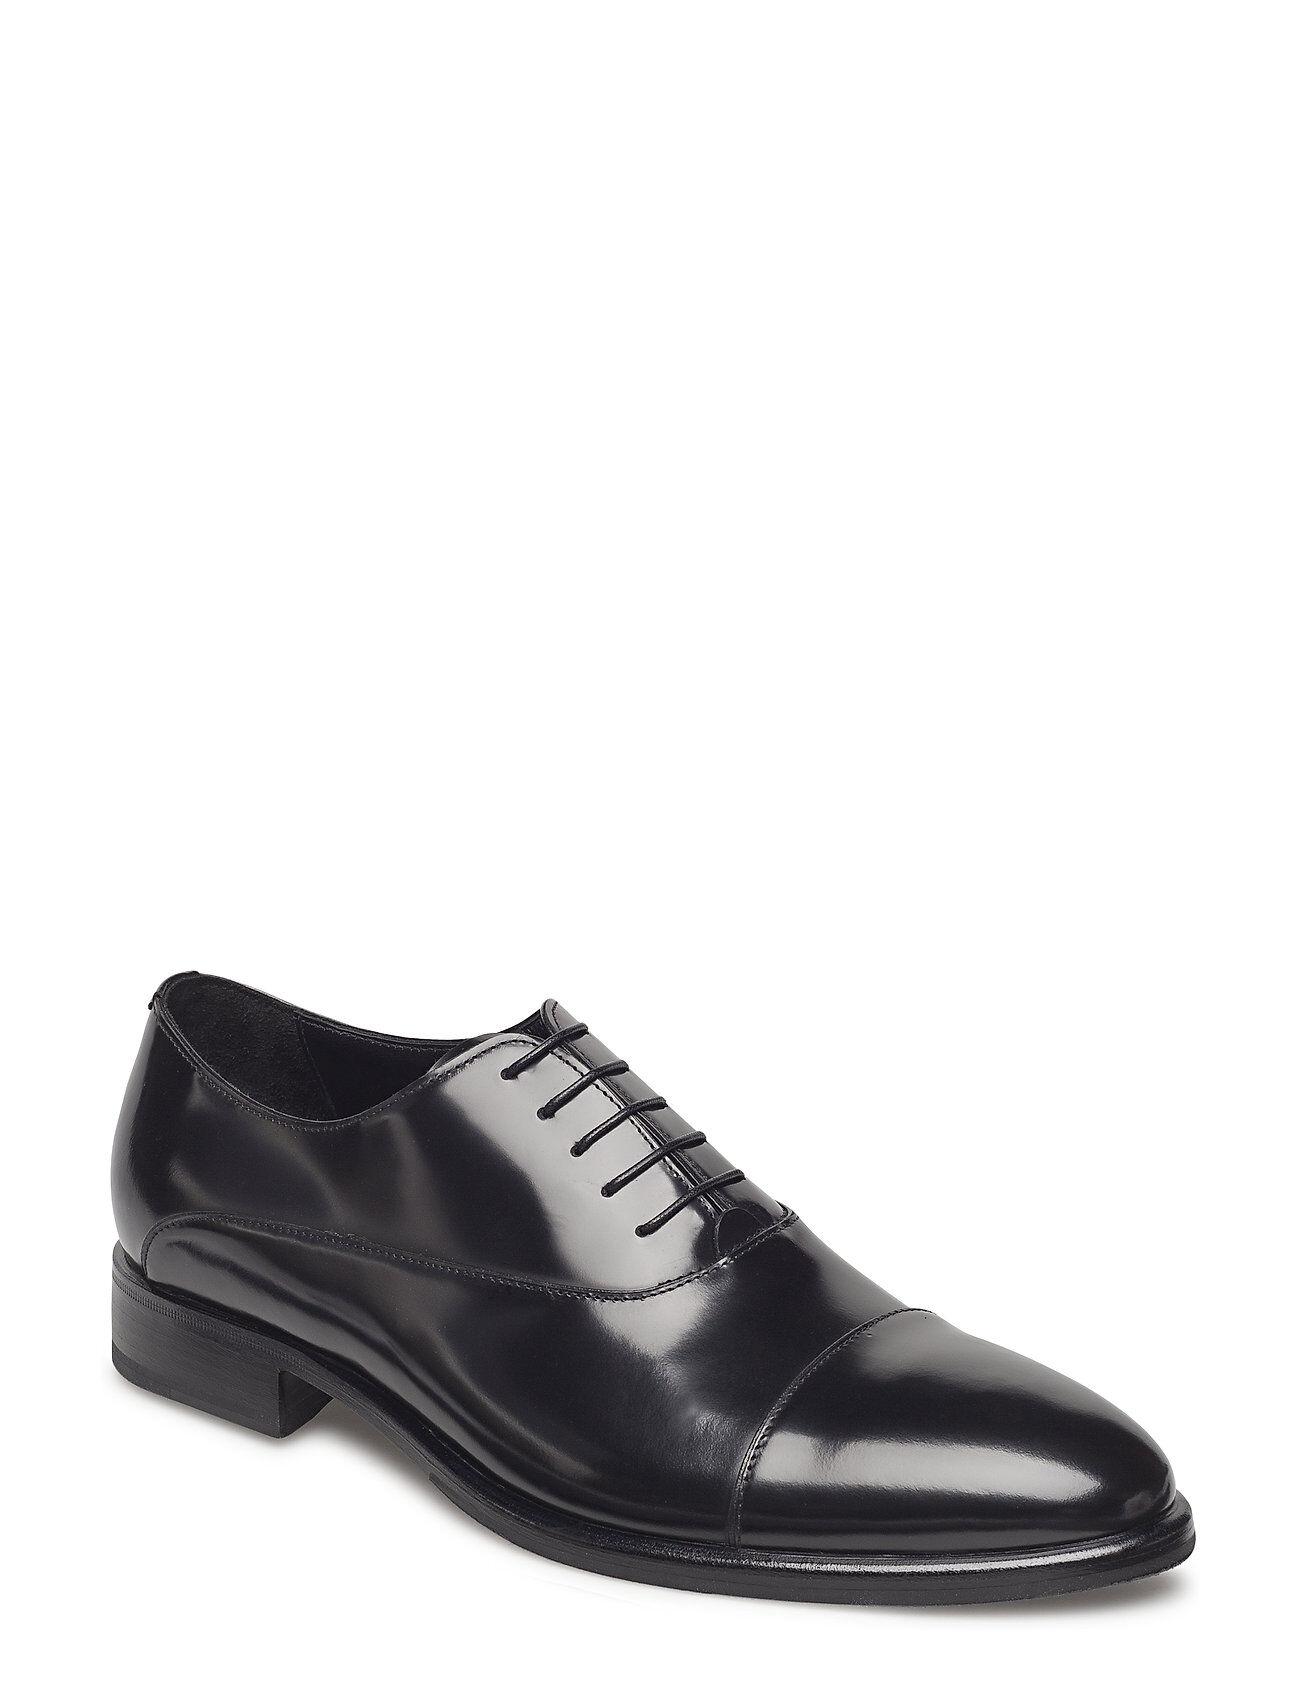 SAND Footwear Mw - F321